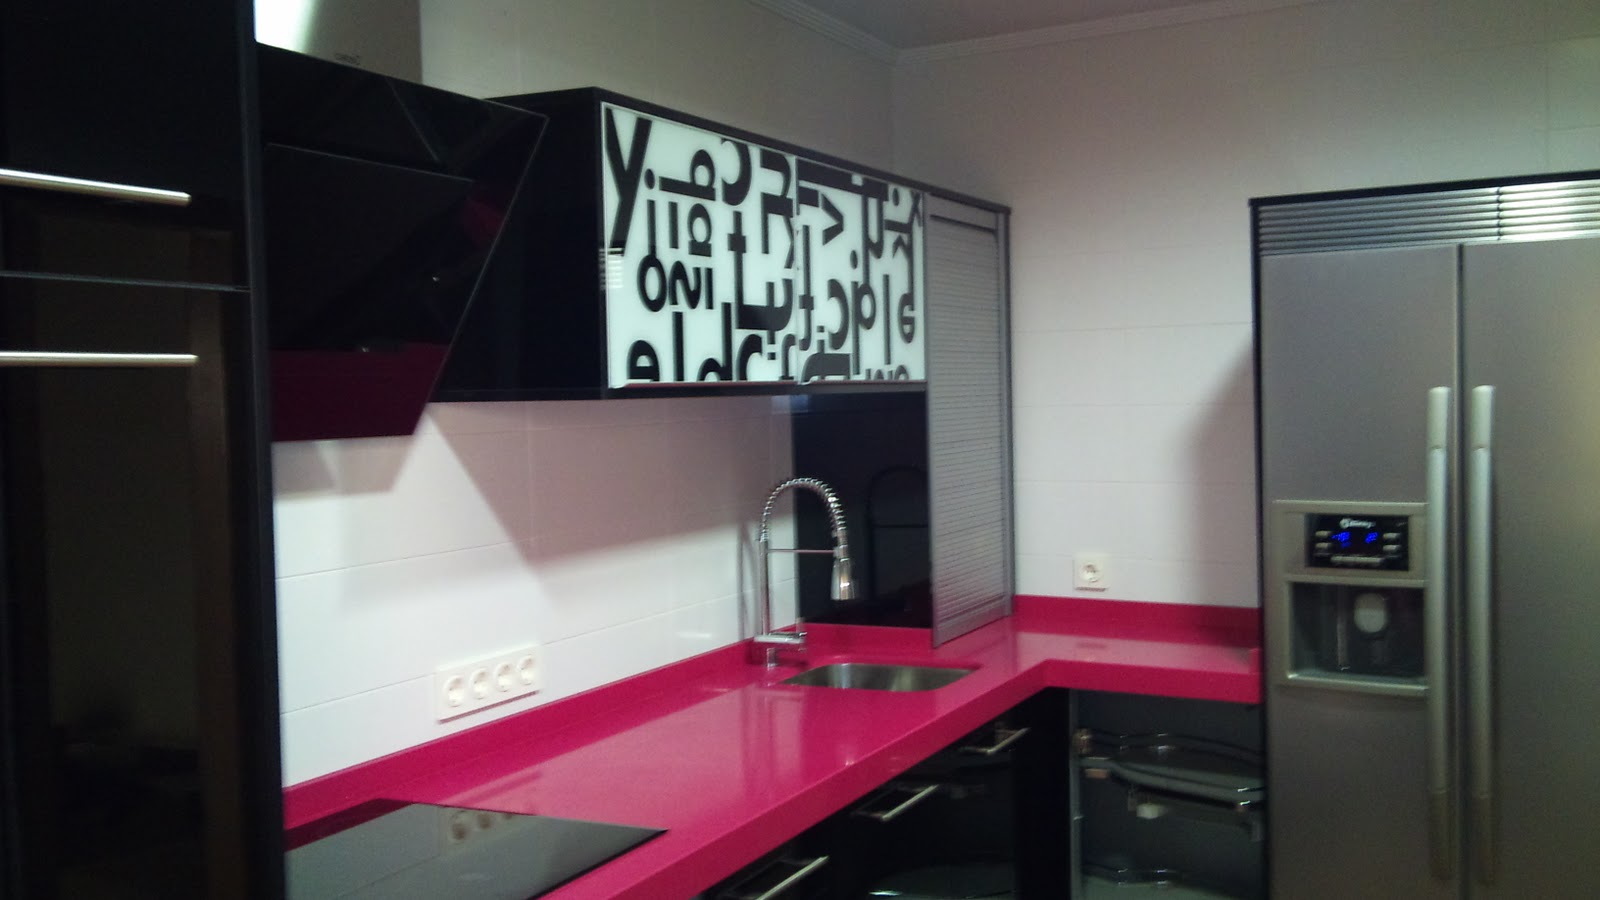 Montajes pacheco dominguez dmp dise o canteado cocinas modernas - Cocinas rosa fucsia ...